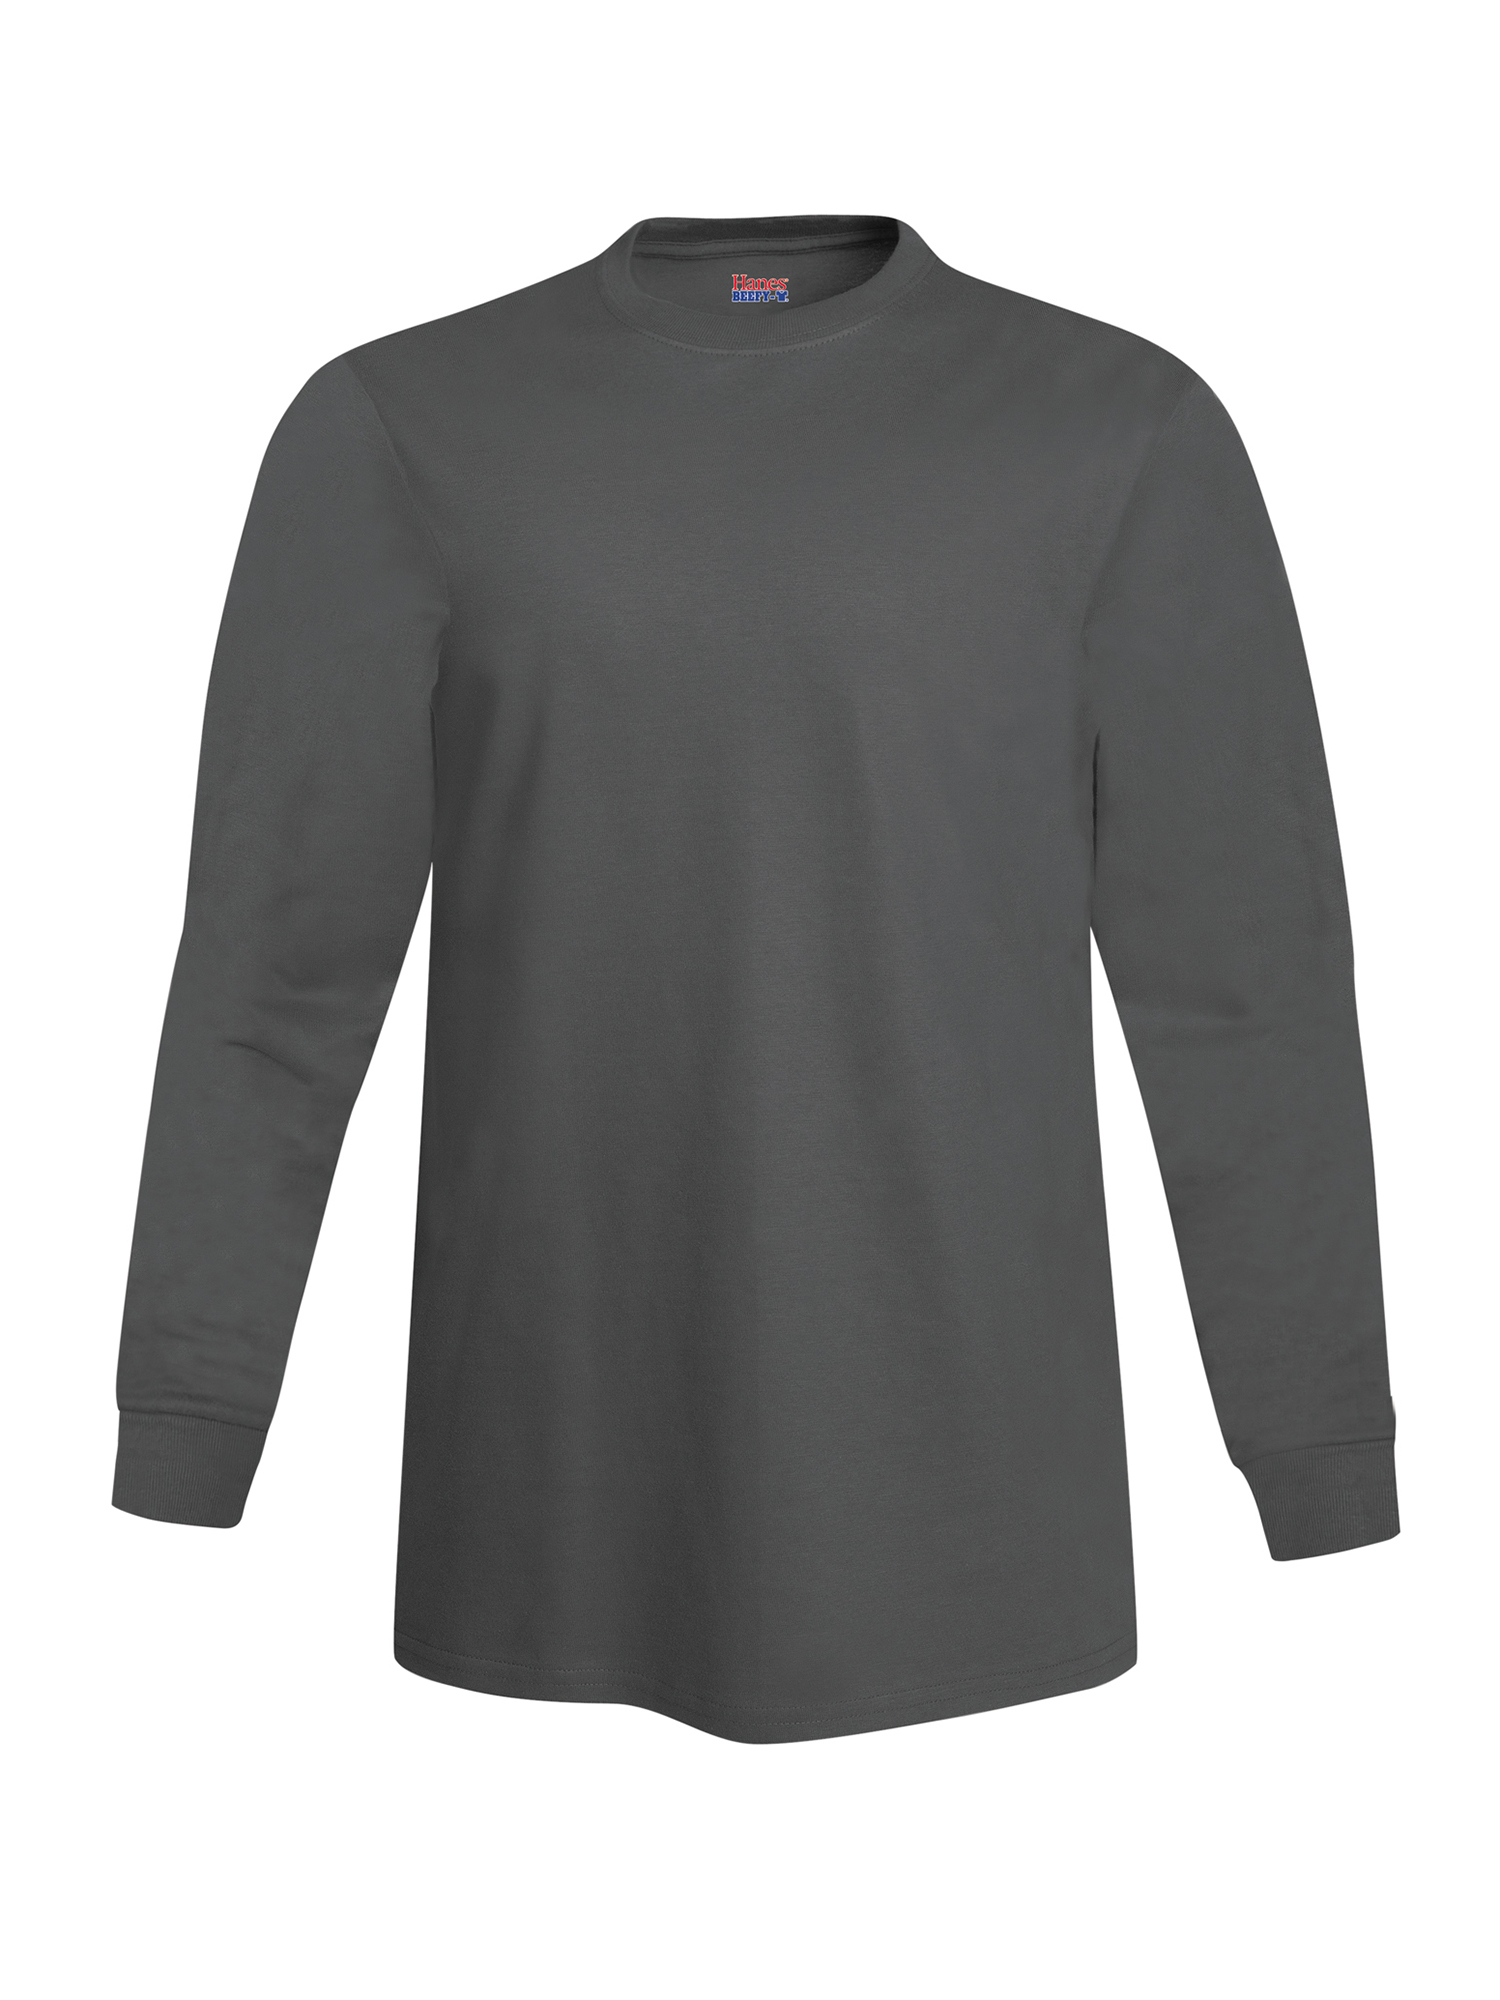 Hanes Men s Beefy Long Sleeve T-shirt 3efa6b2d9f5